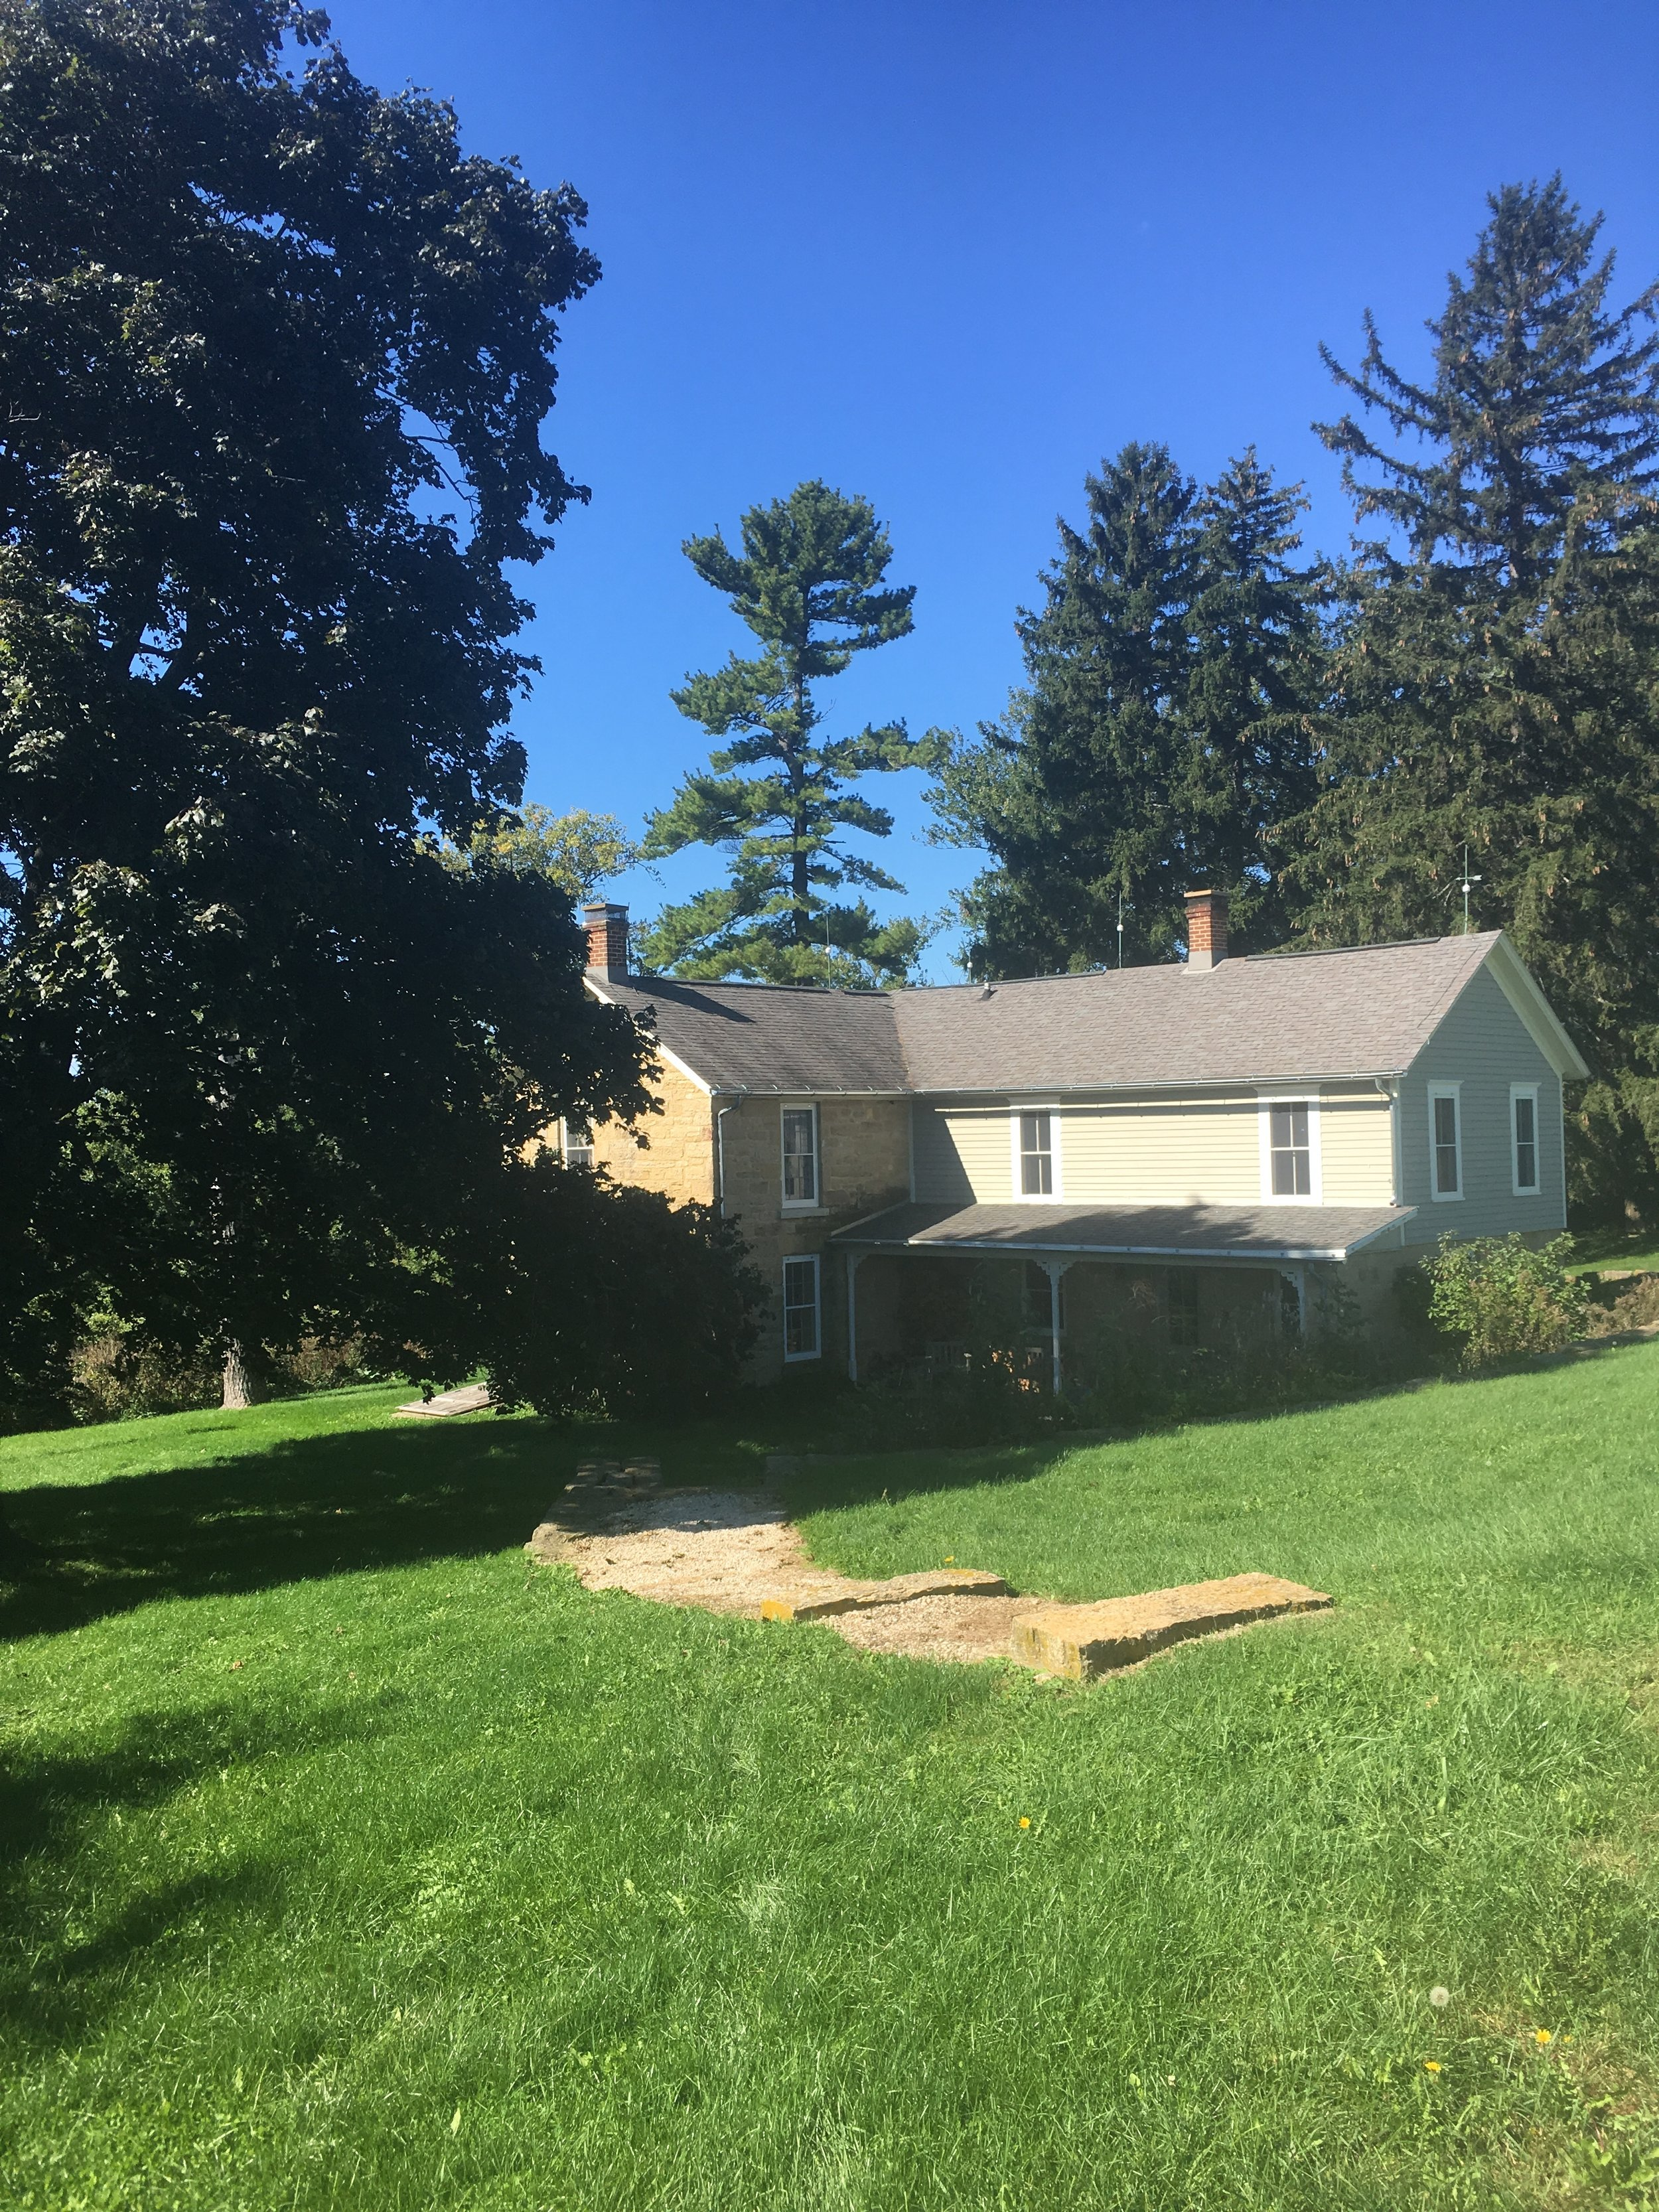 Historic Farmhouse Landscape - Before